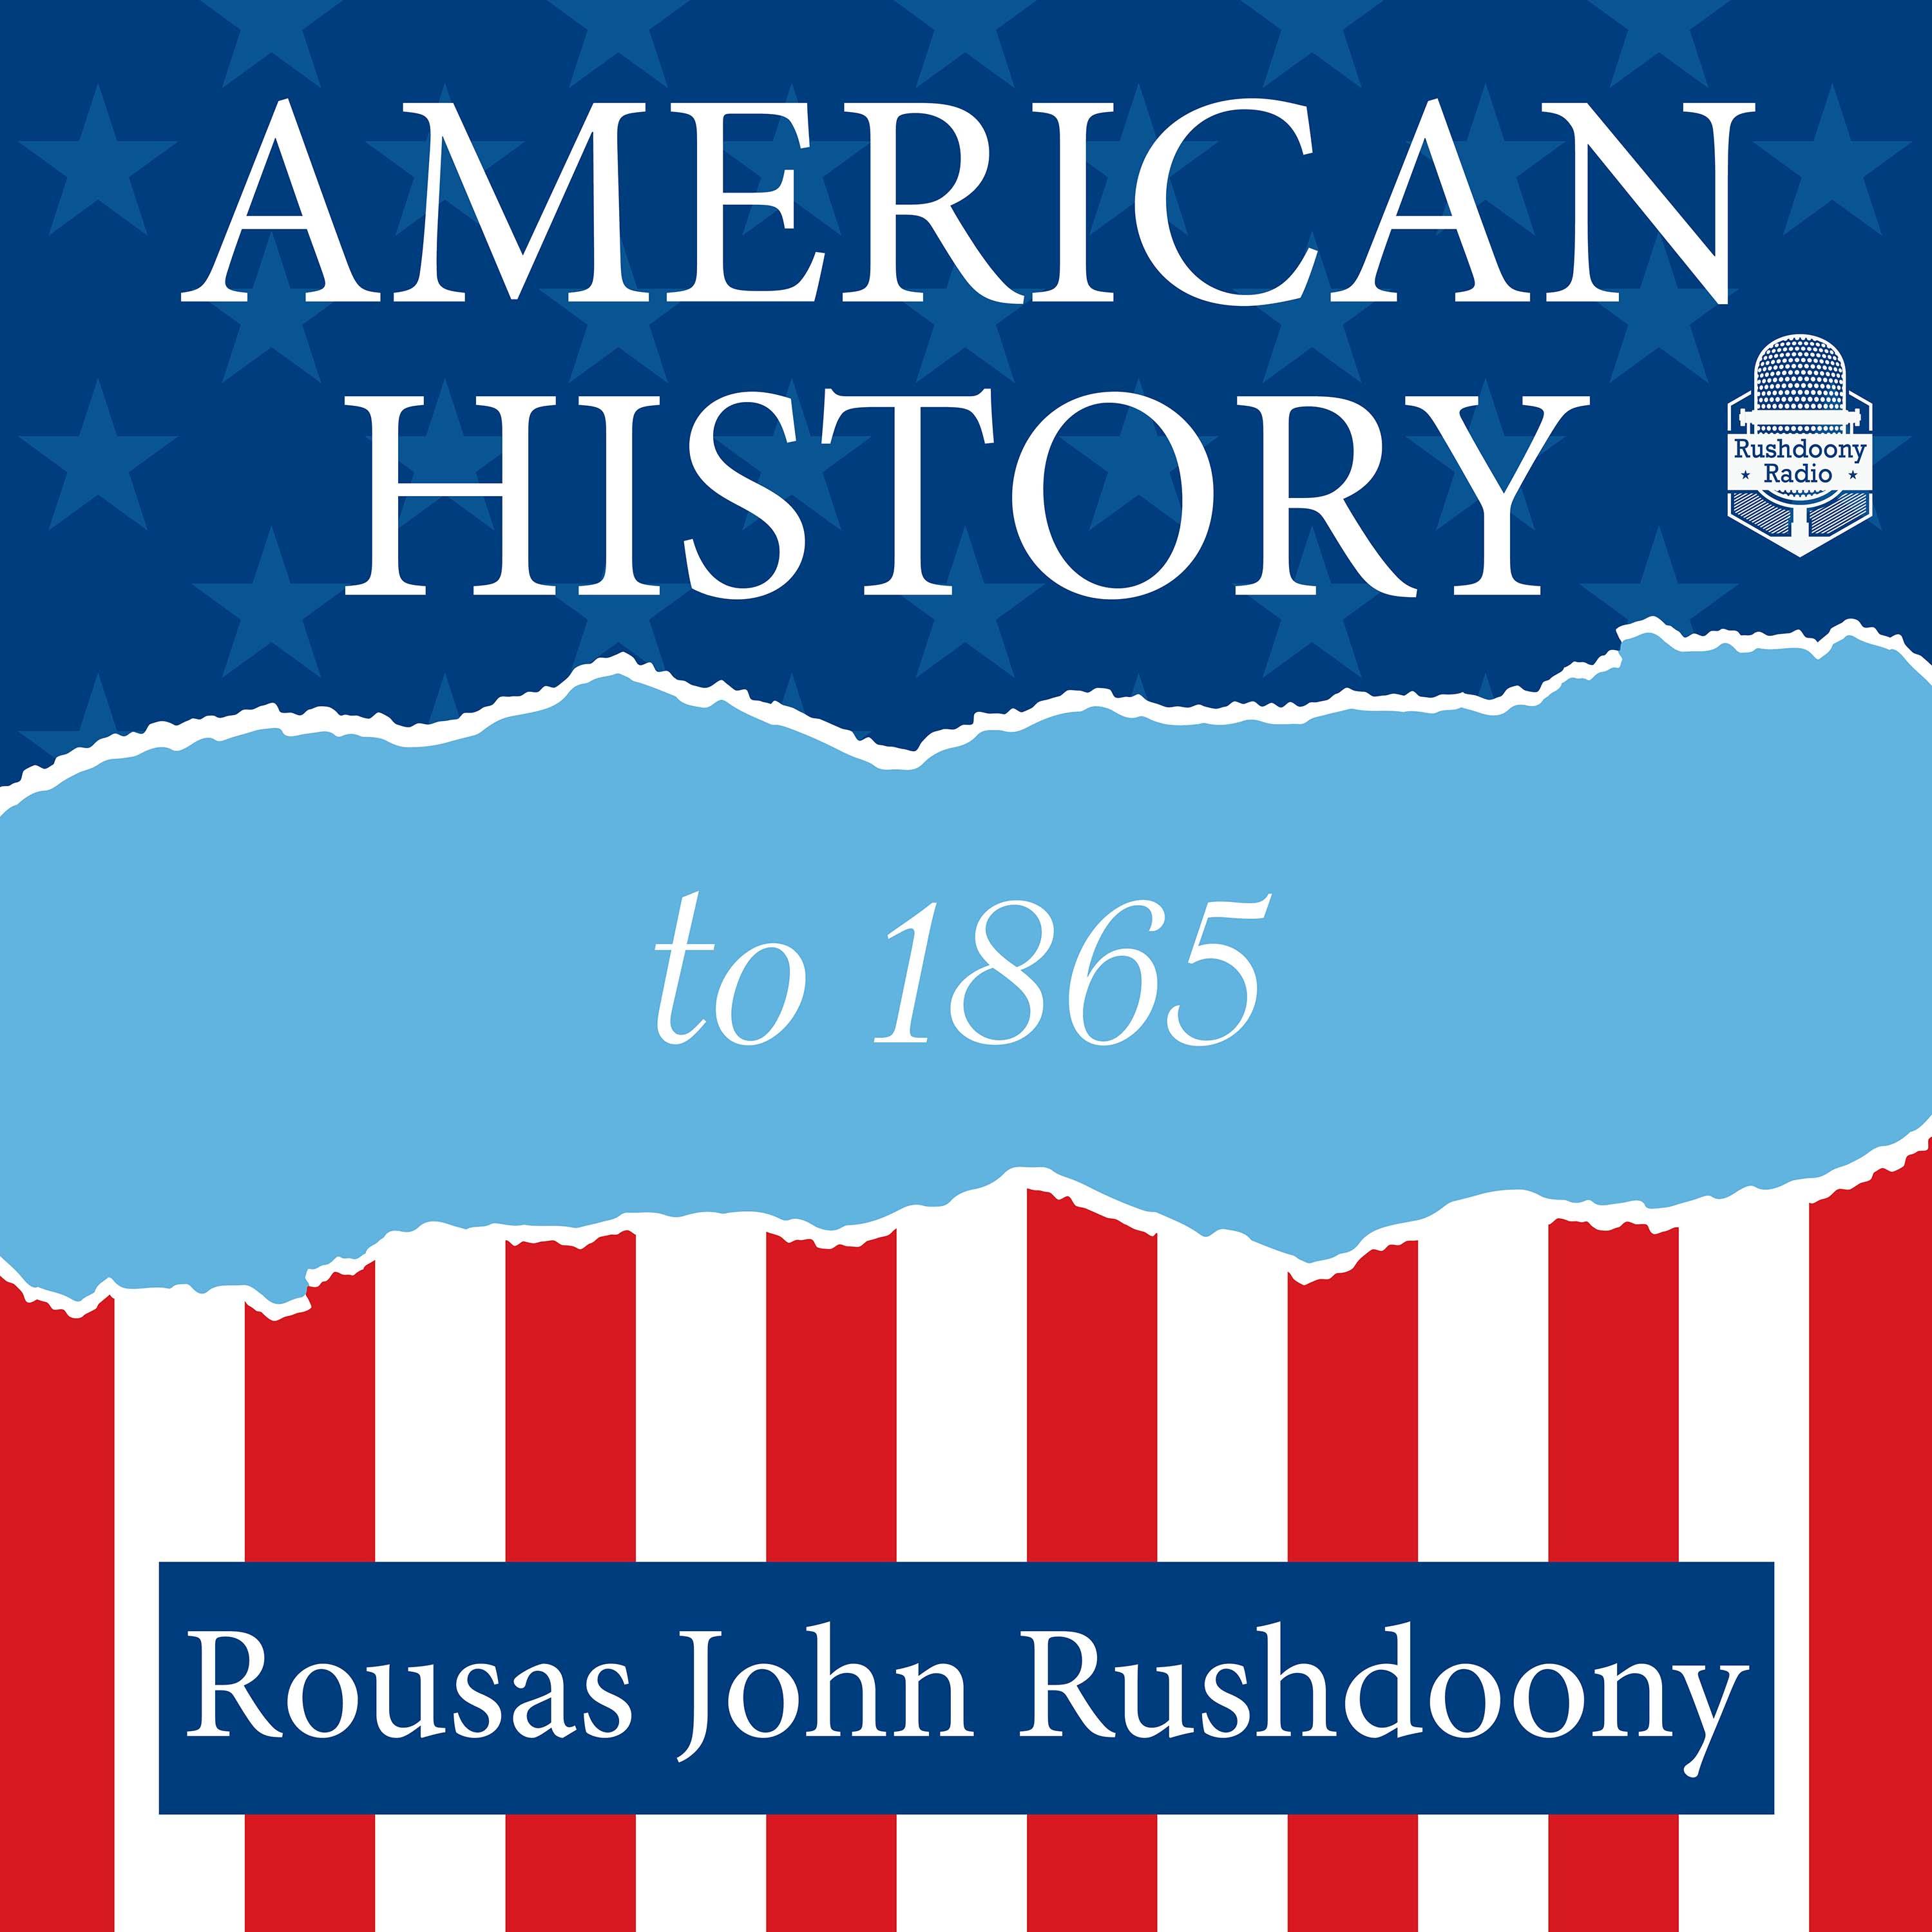 American History to 1865 | Rushdoony Radio